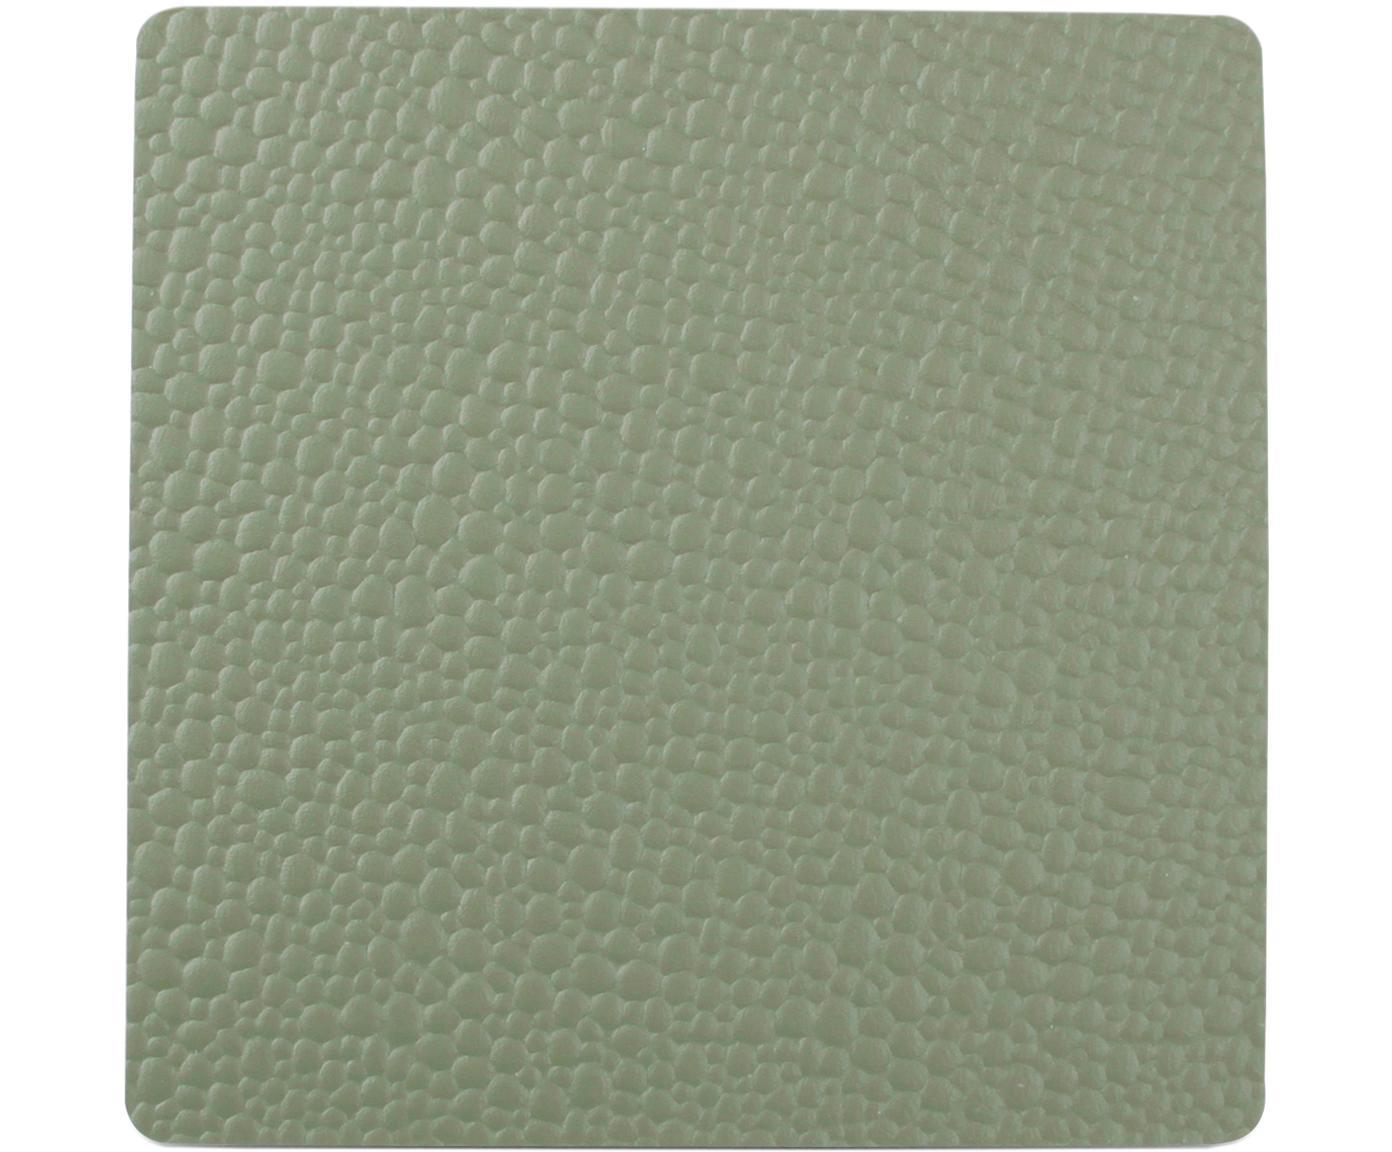 Untersetzer Tably, 4 Stück, Kunstleder, Grün, 10 x 2 cm